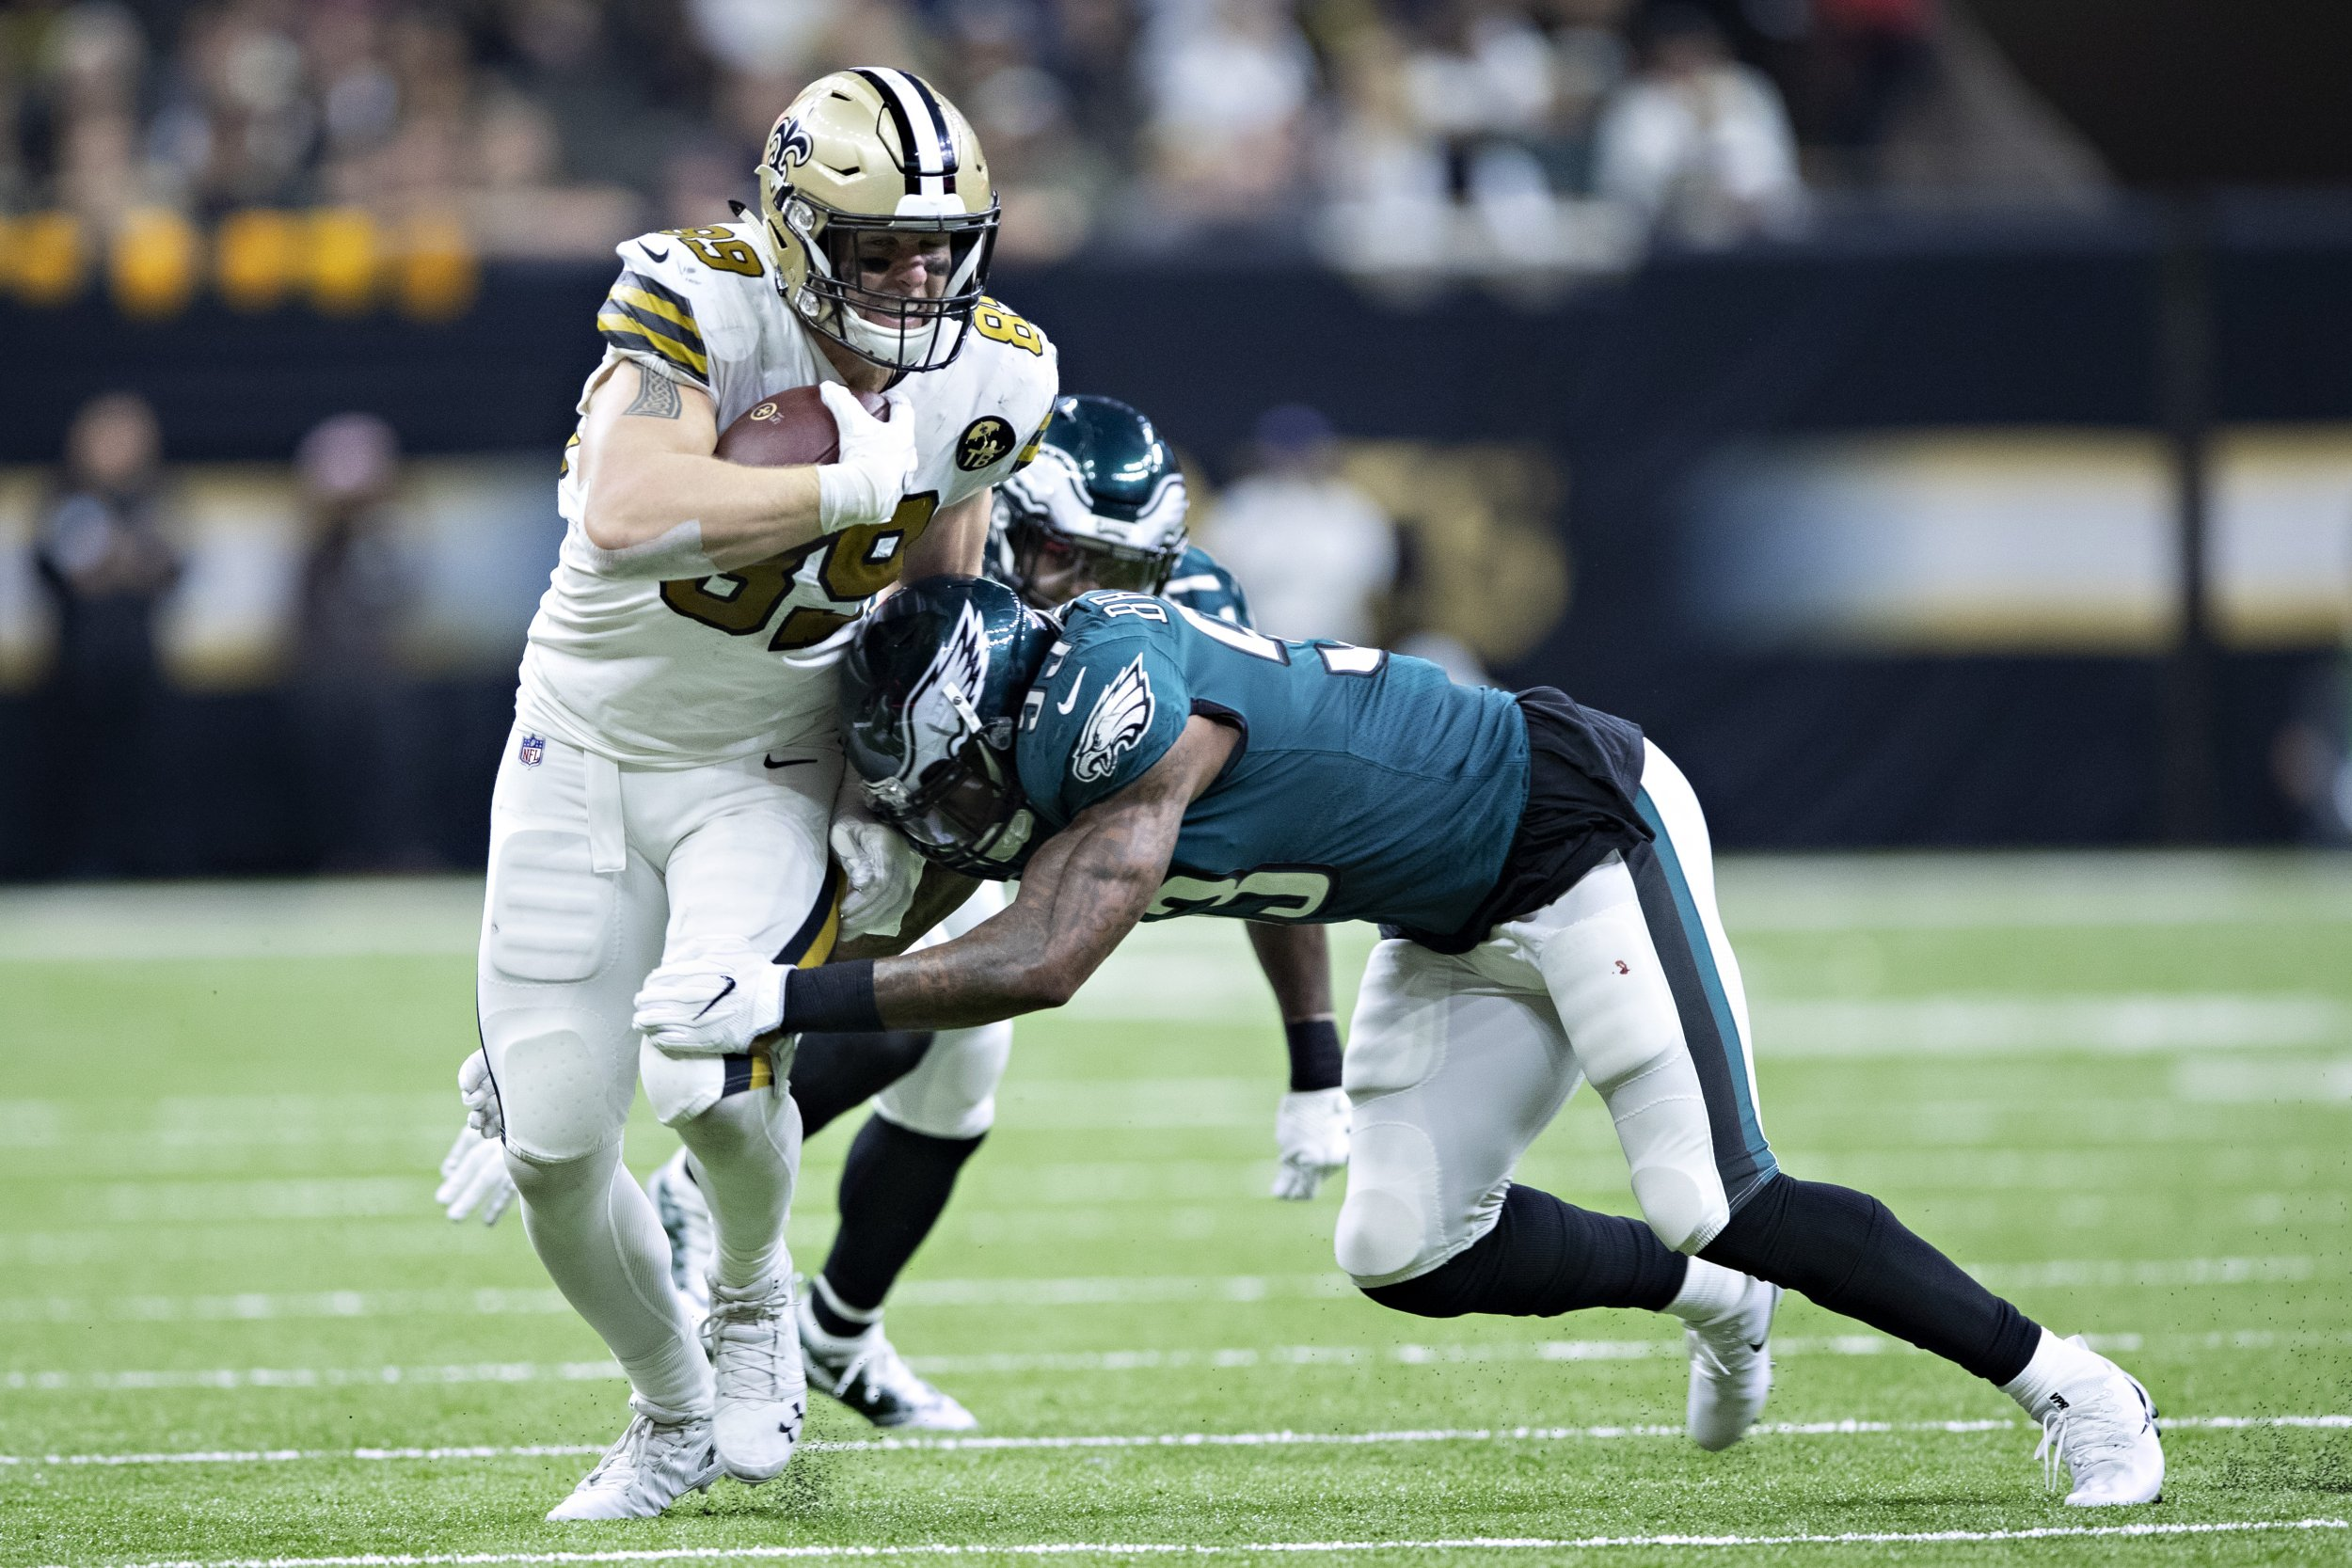 ae37deba NFL Playoffs: How to Watch, Live Stream the Philadelphia Eagles vs ...